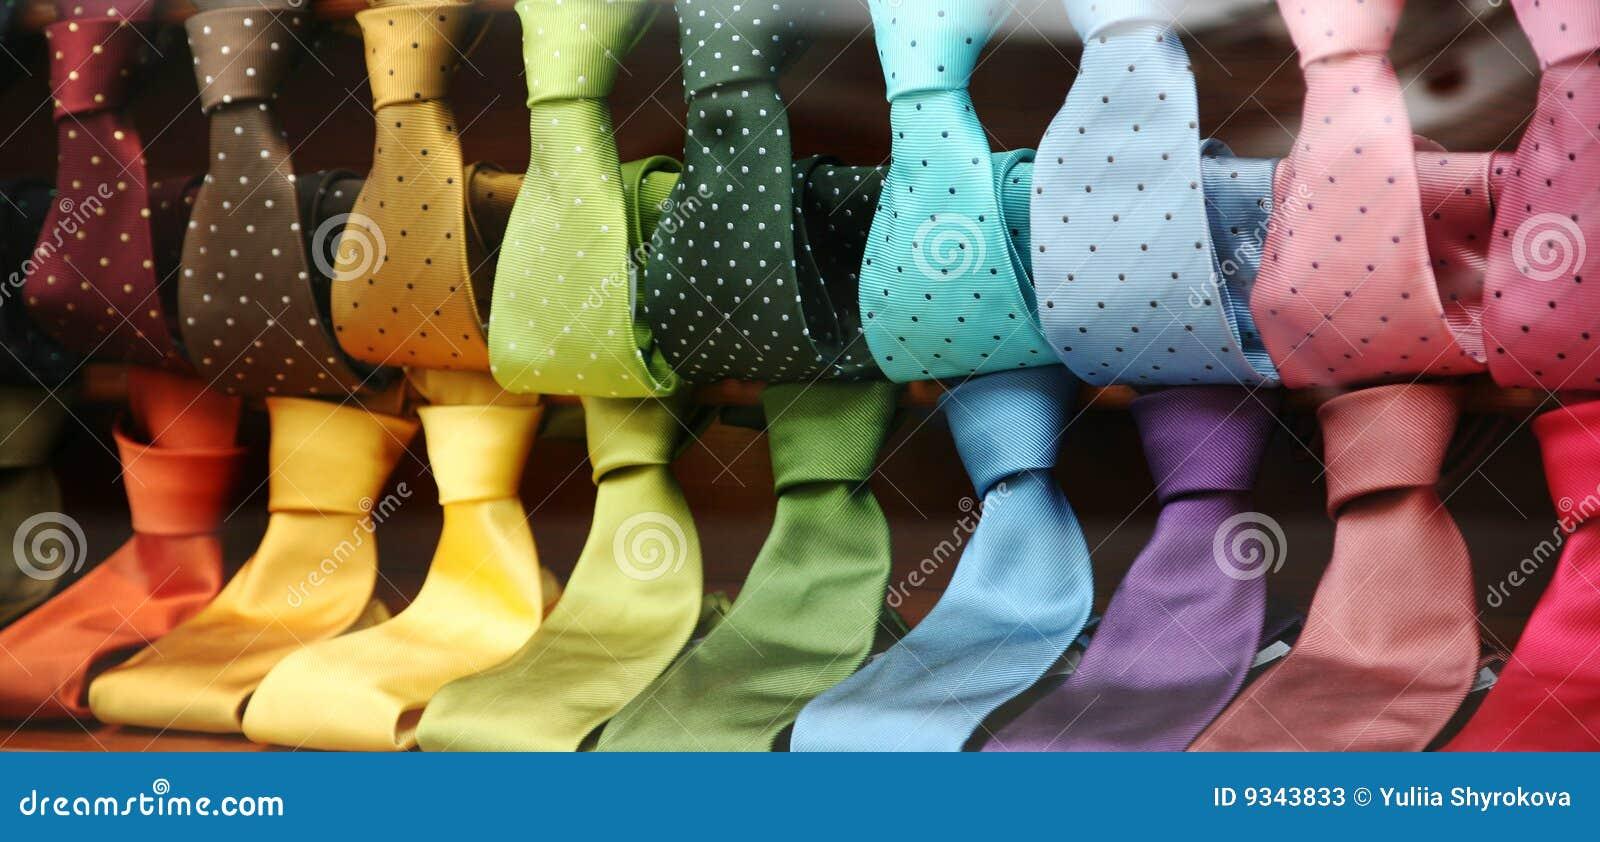 Varicolored Ties in a shopwindow